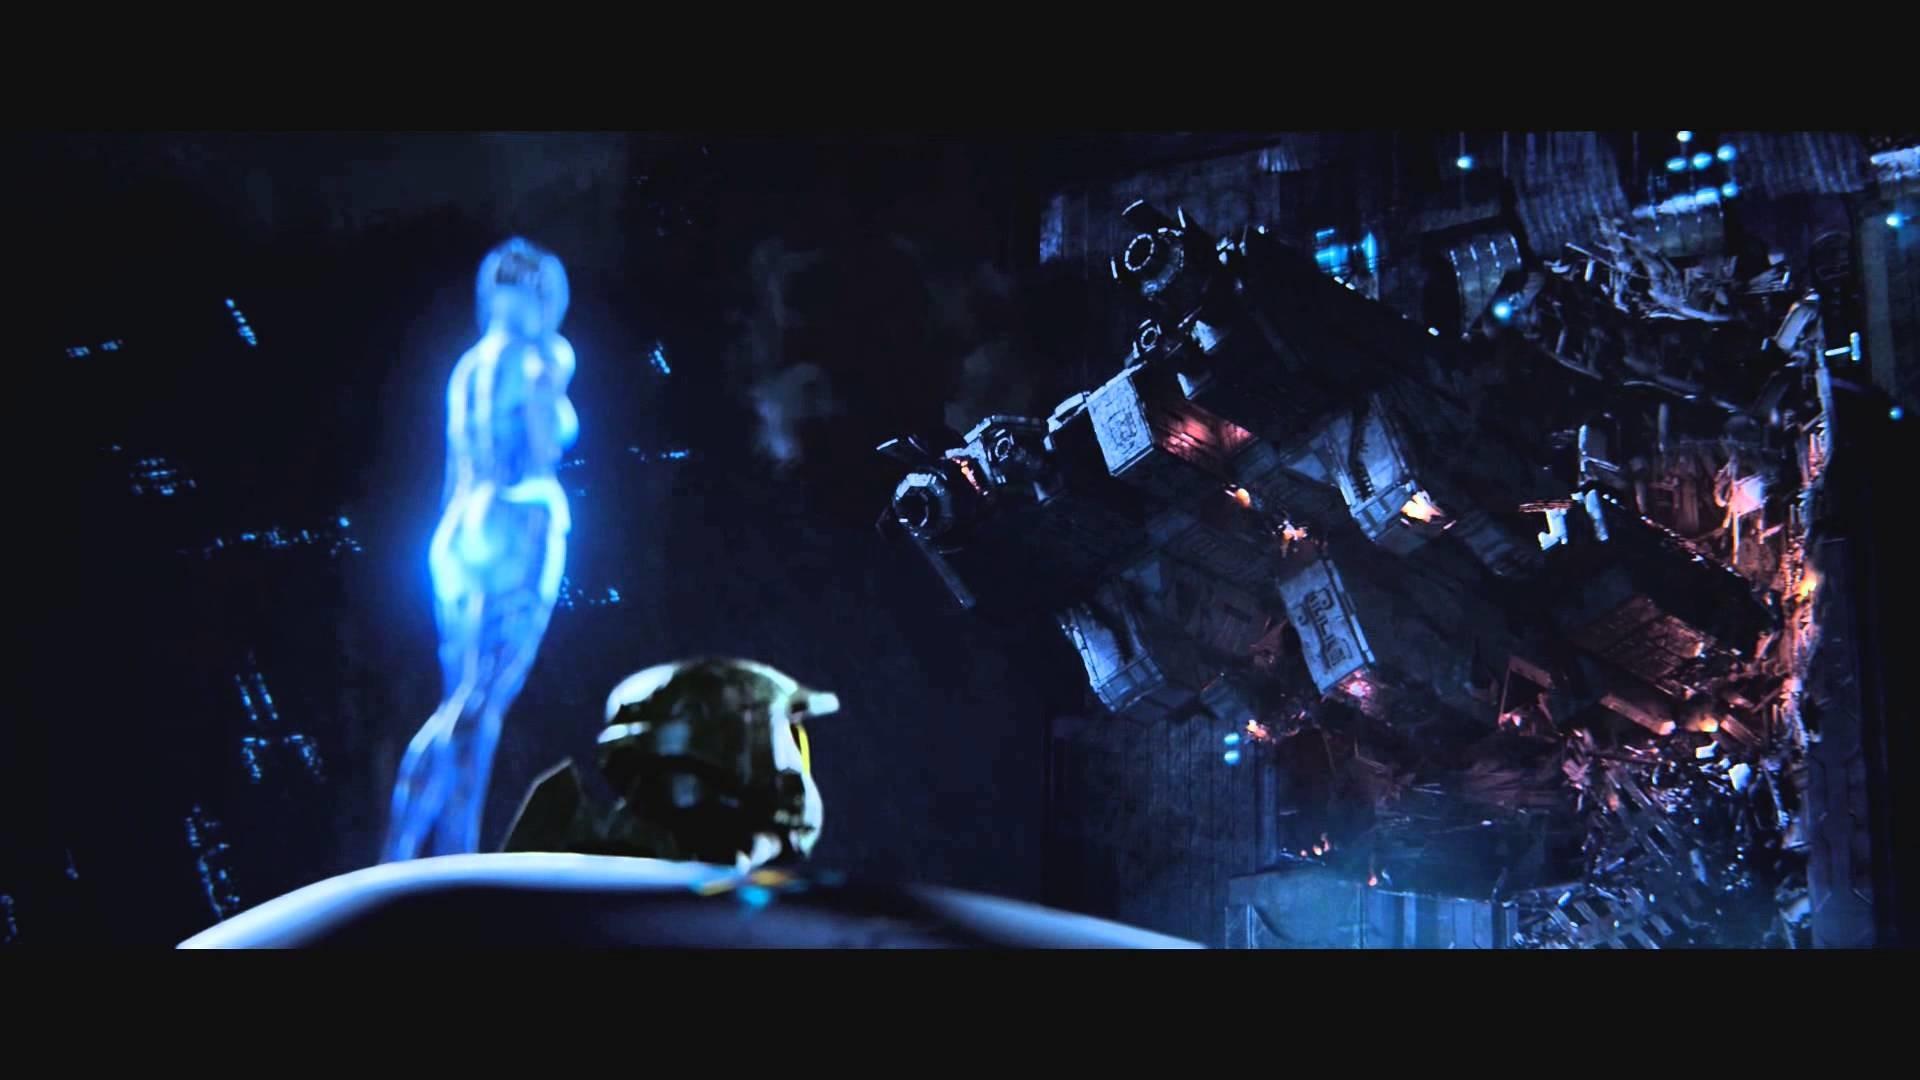 Halo 2 Anniversary Full Mission Cutscene 12 High Charity 1080p HD